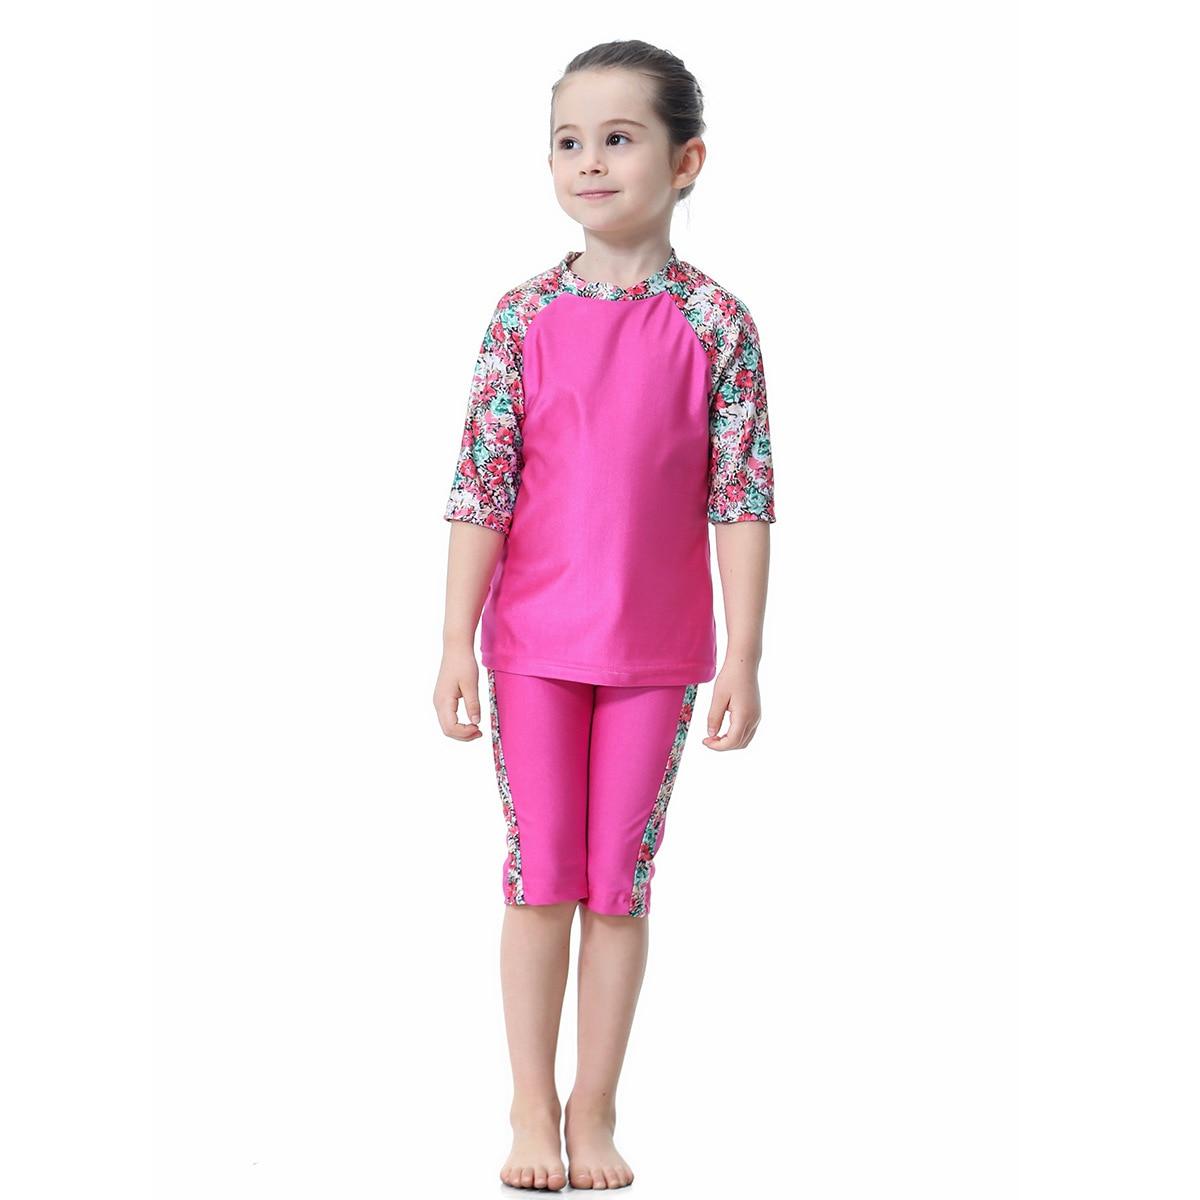 Muslim Hui Nationality GIRL'S Swimsuit Conservative Split Type Swimming Suit, H2006, AliExpress EBay Amazon Hot Selling